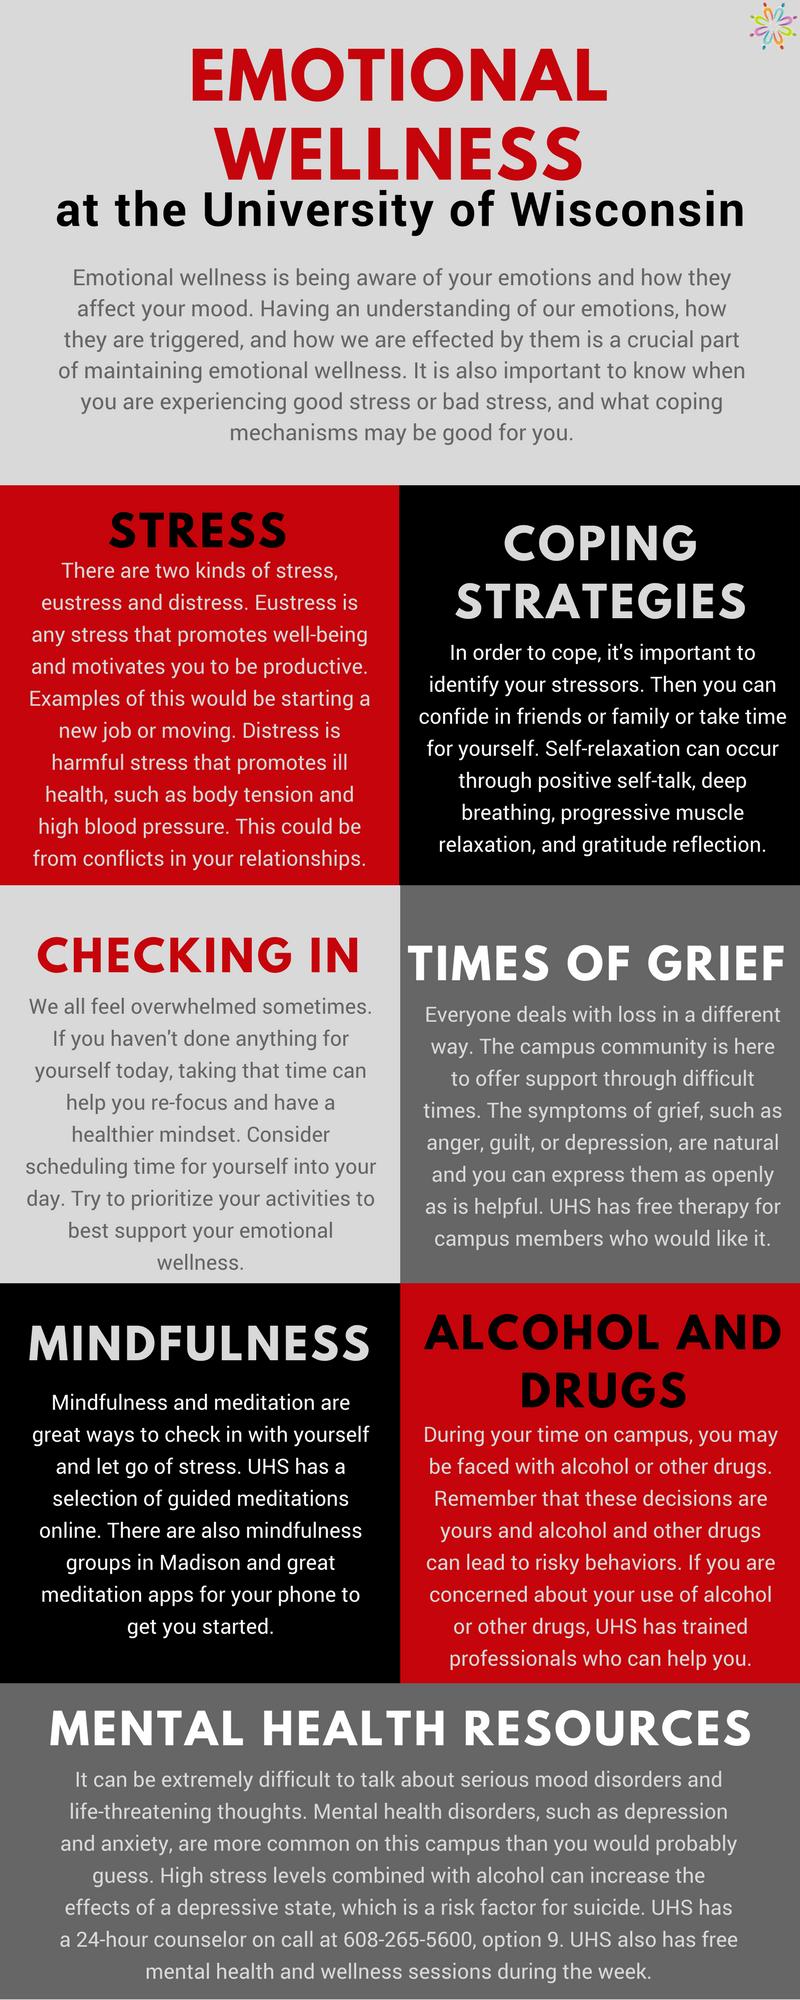 Emotional wellness uwell uwmadison emotional wellness at the university of wisconsin emotional wellness is being aware of your emotions solutioingenieria Gallery